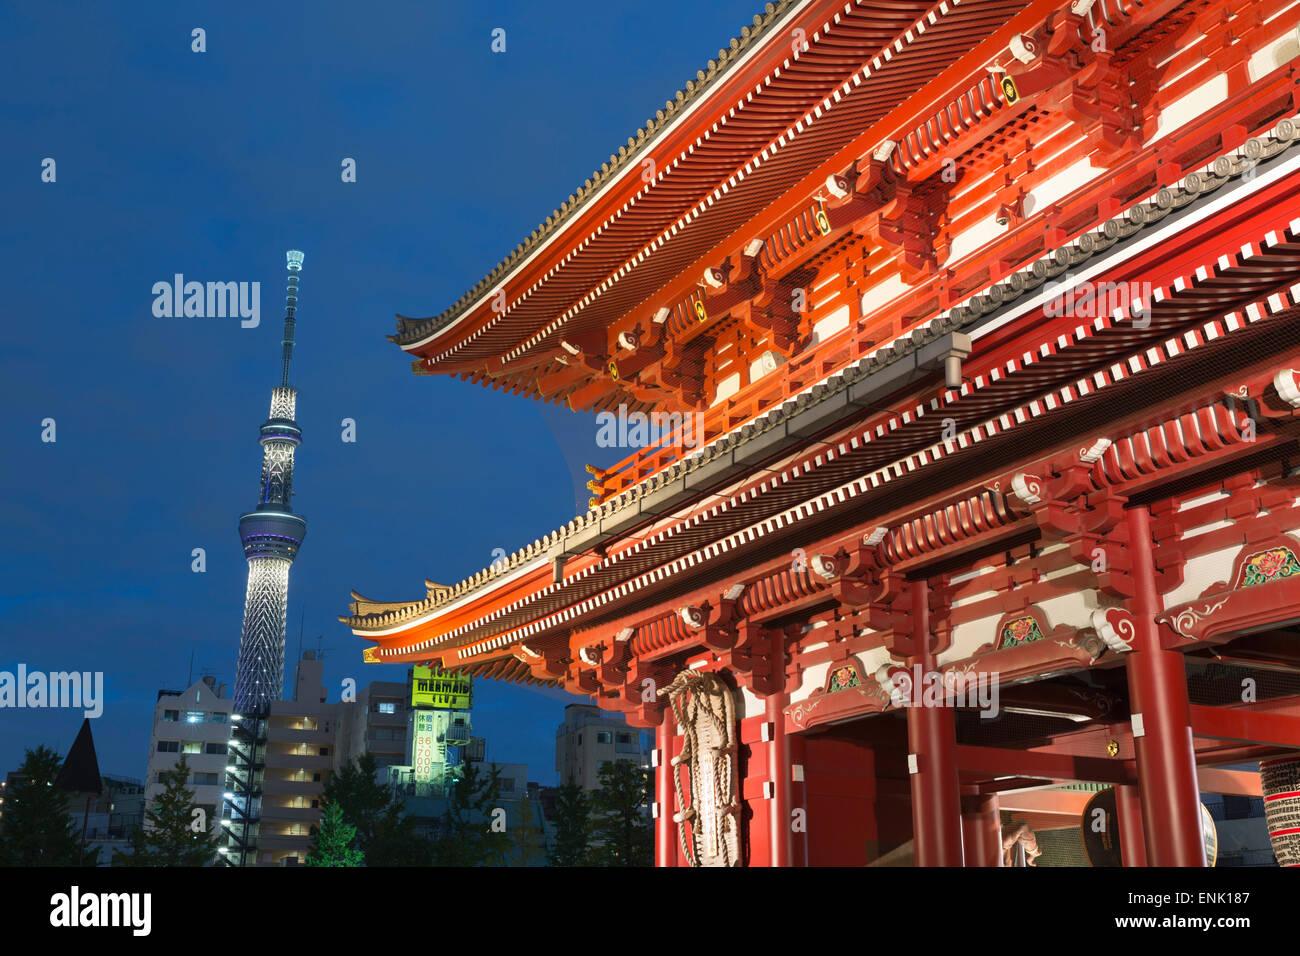 Senso-ji temple and Skytree Tower at night, Asakusa, Tokyo, Japan, Asia - Stock Image